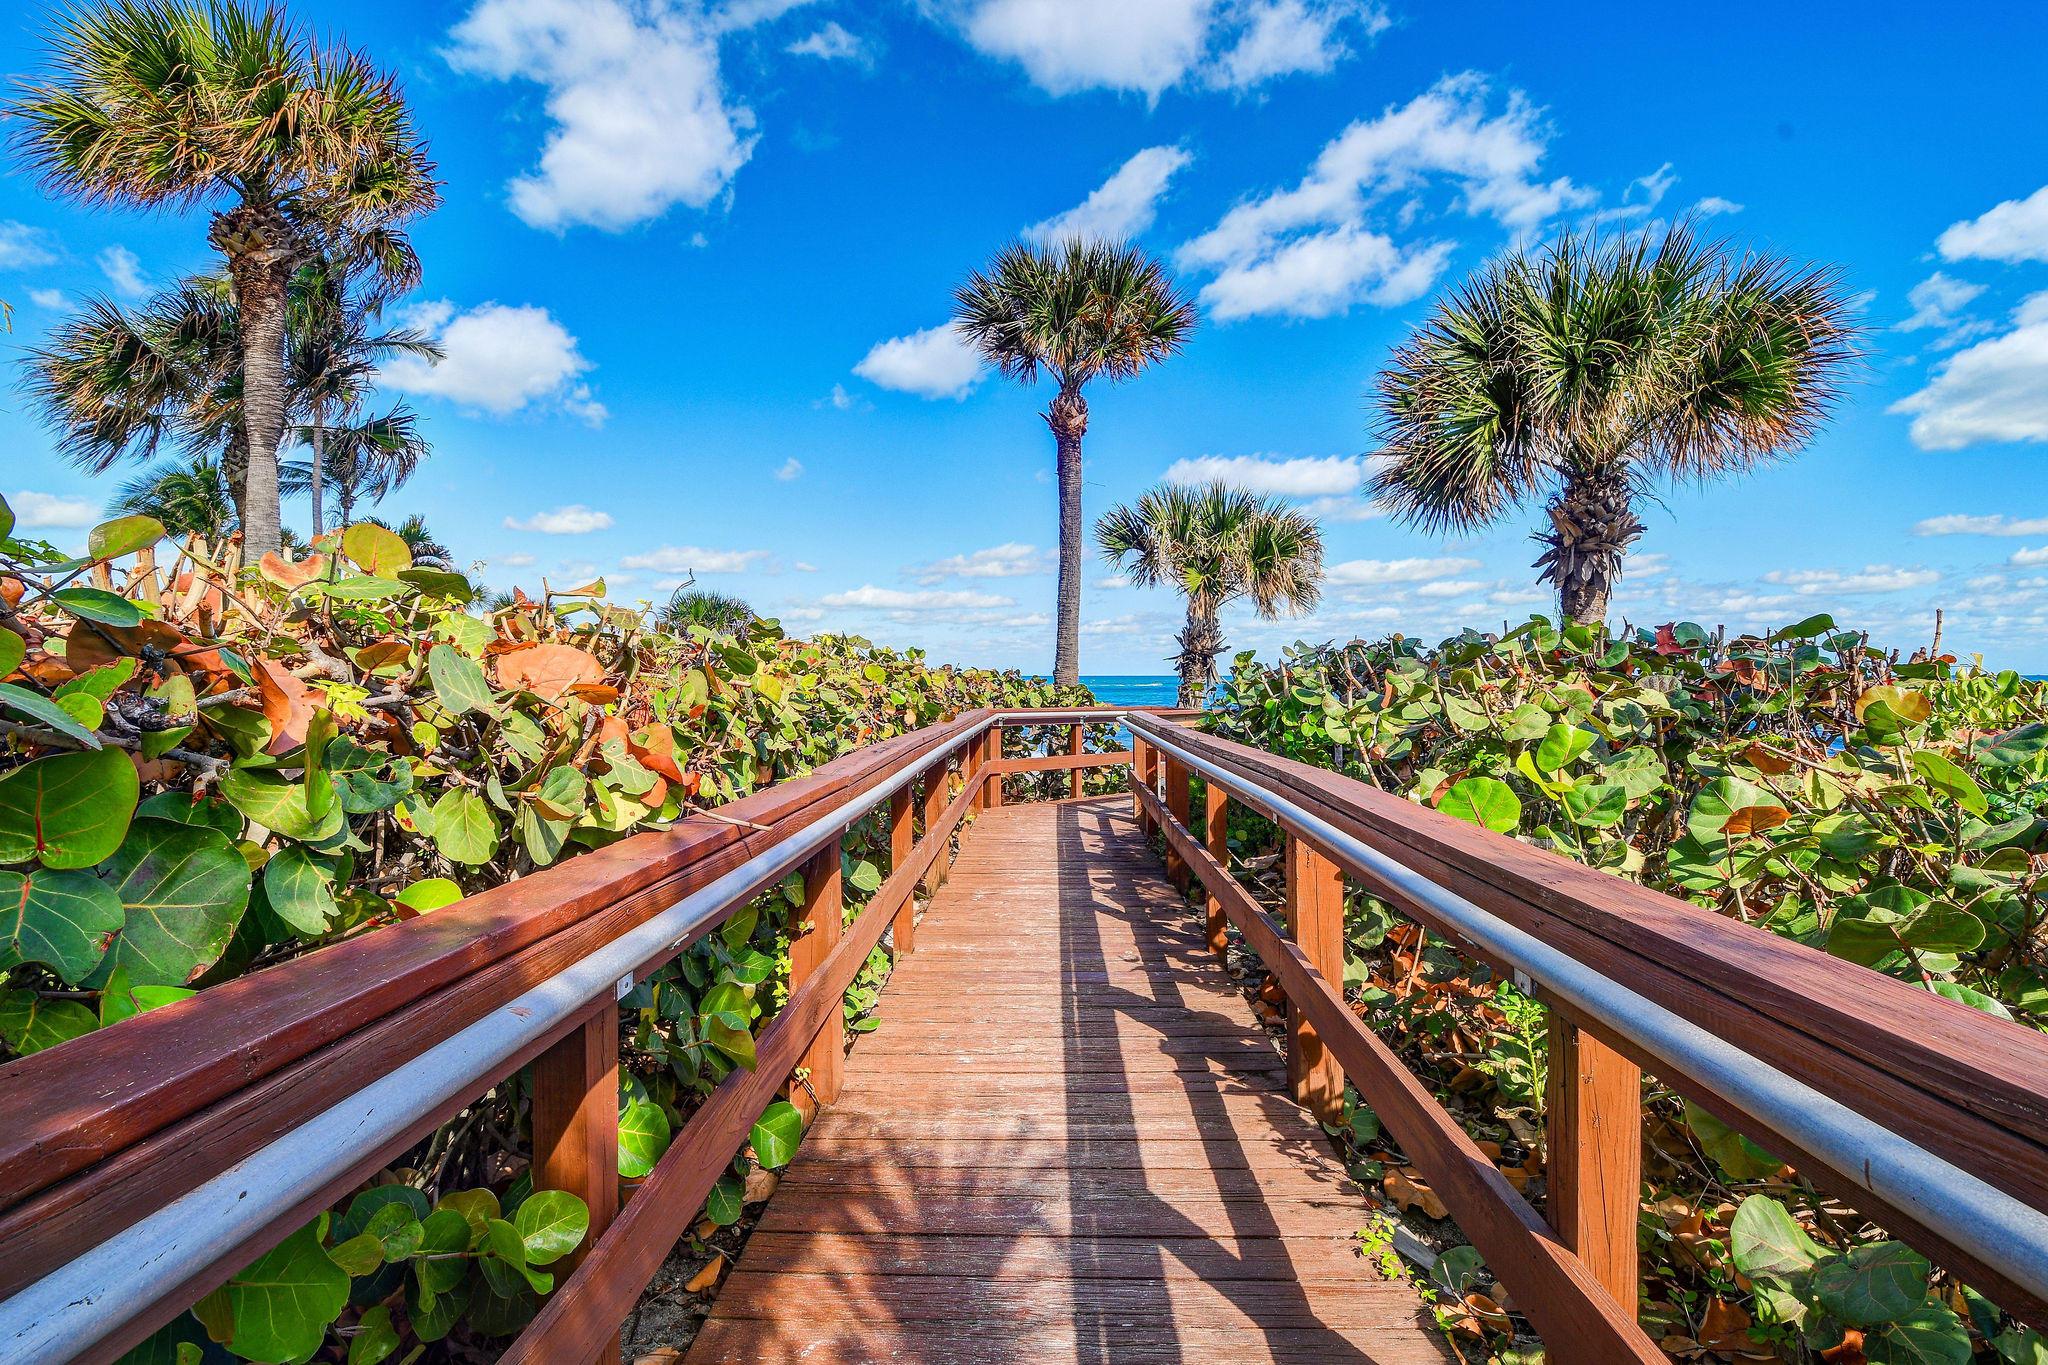 400 Ocean Trail Way, 108 - Jupiter, Florida